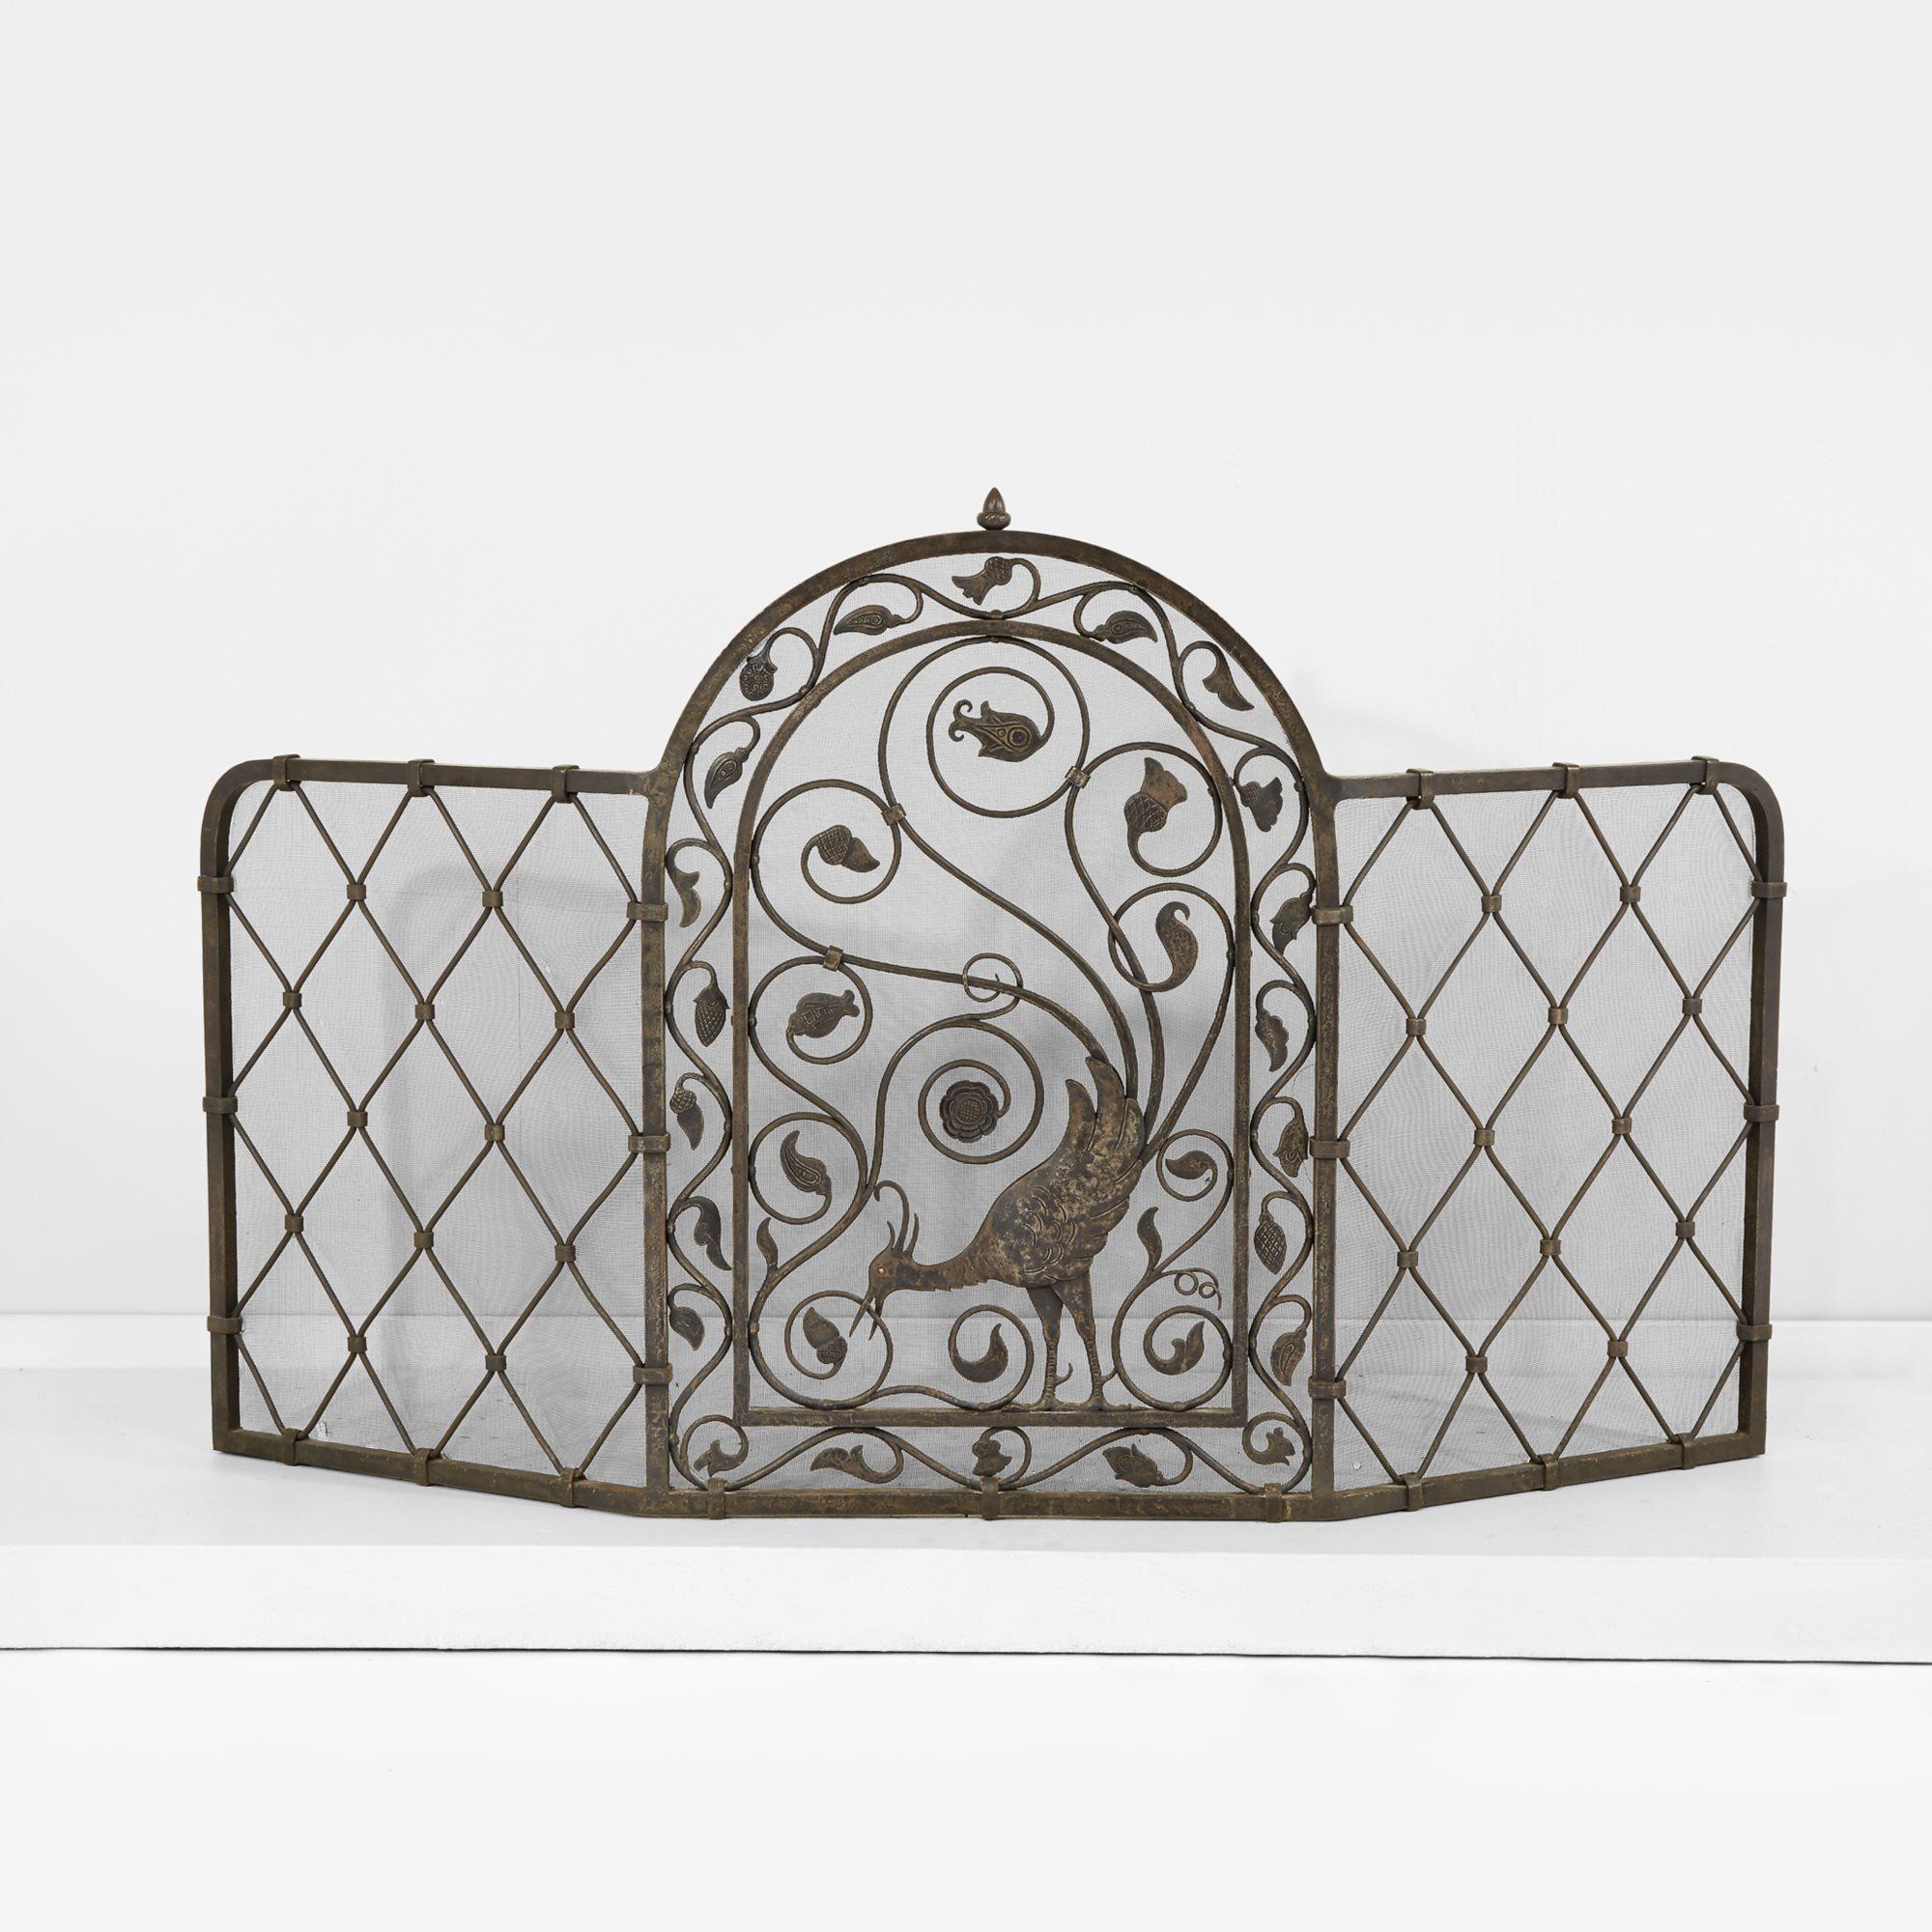 Lot 40  |  Samuel Yellin (American, b. Russia, 1884-1940), Fine Fire Screen for the Abraham T. Malmed Residence, $15,000-25,000